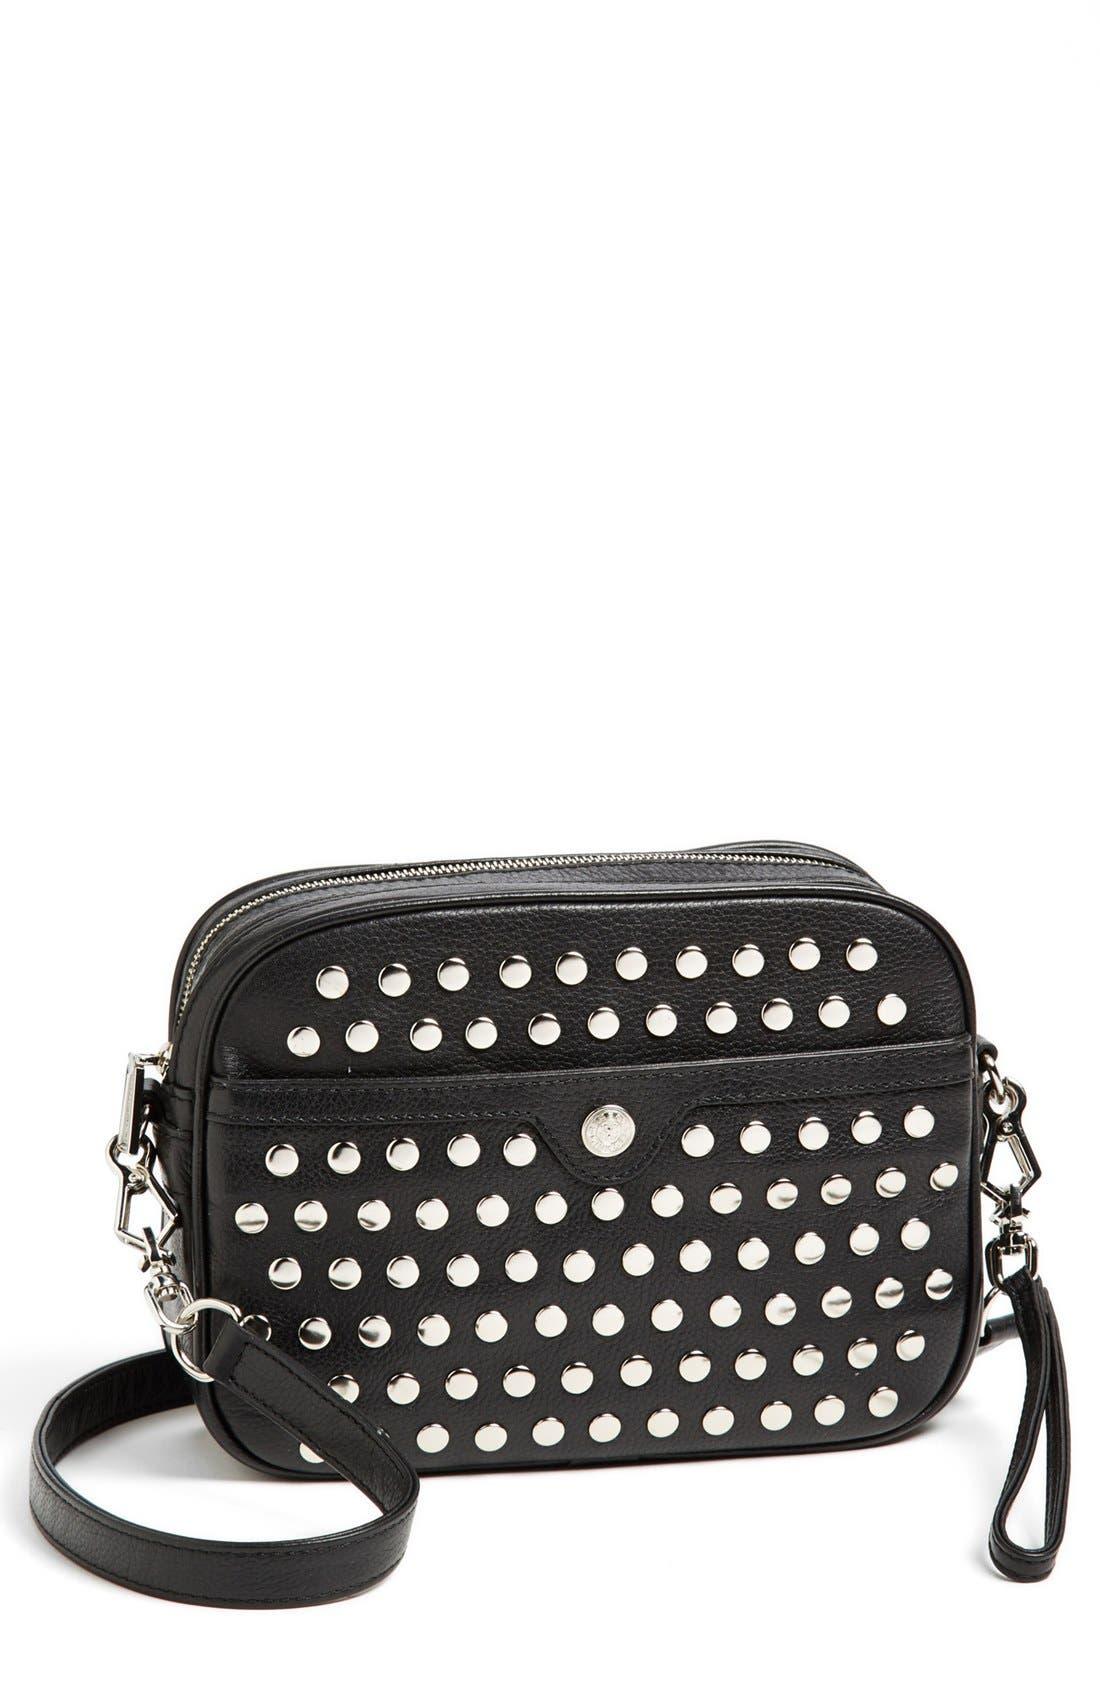 Main Image - Rebecca Minkoff 'Rumor' Leather Crossbody Bag, Small